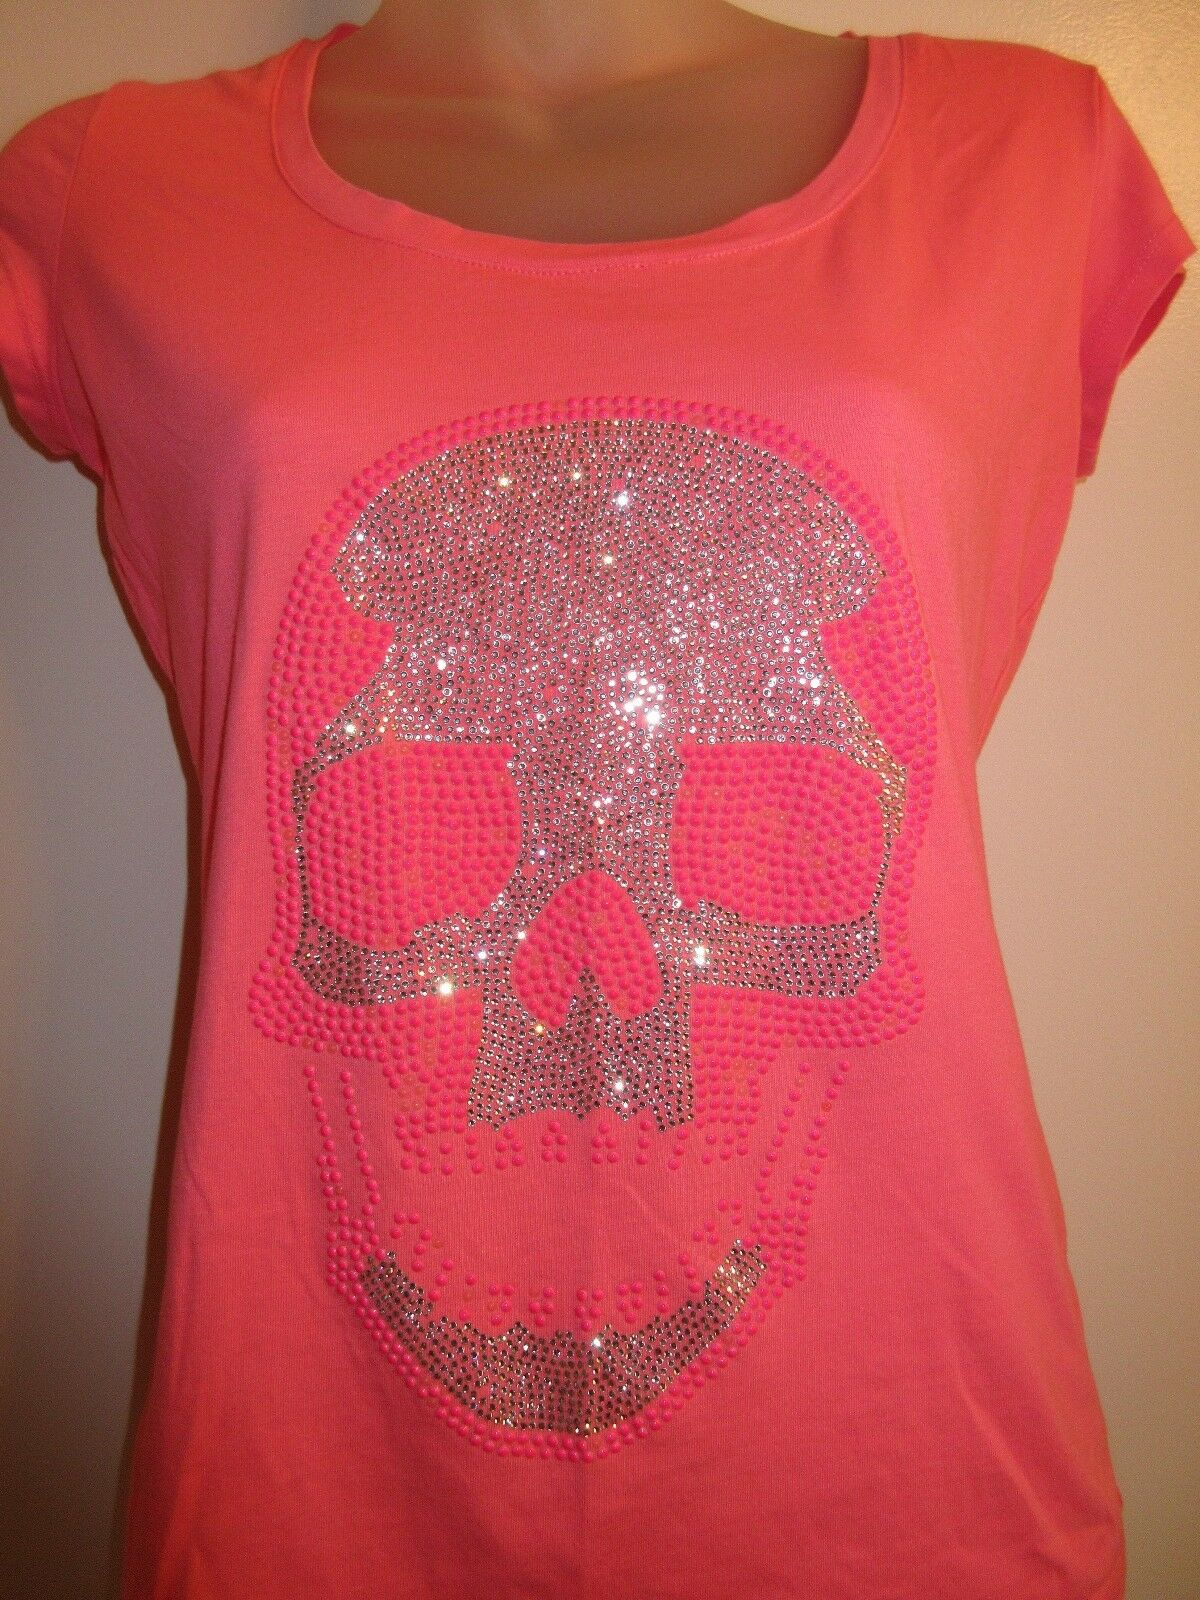 Phillipp Plein S Embellished Shirt Top Rhinestone Crystal Hot Rosa Tee Halloween